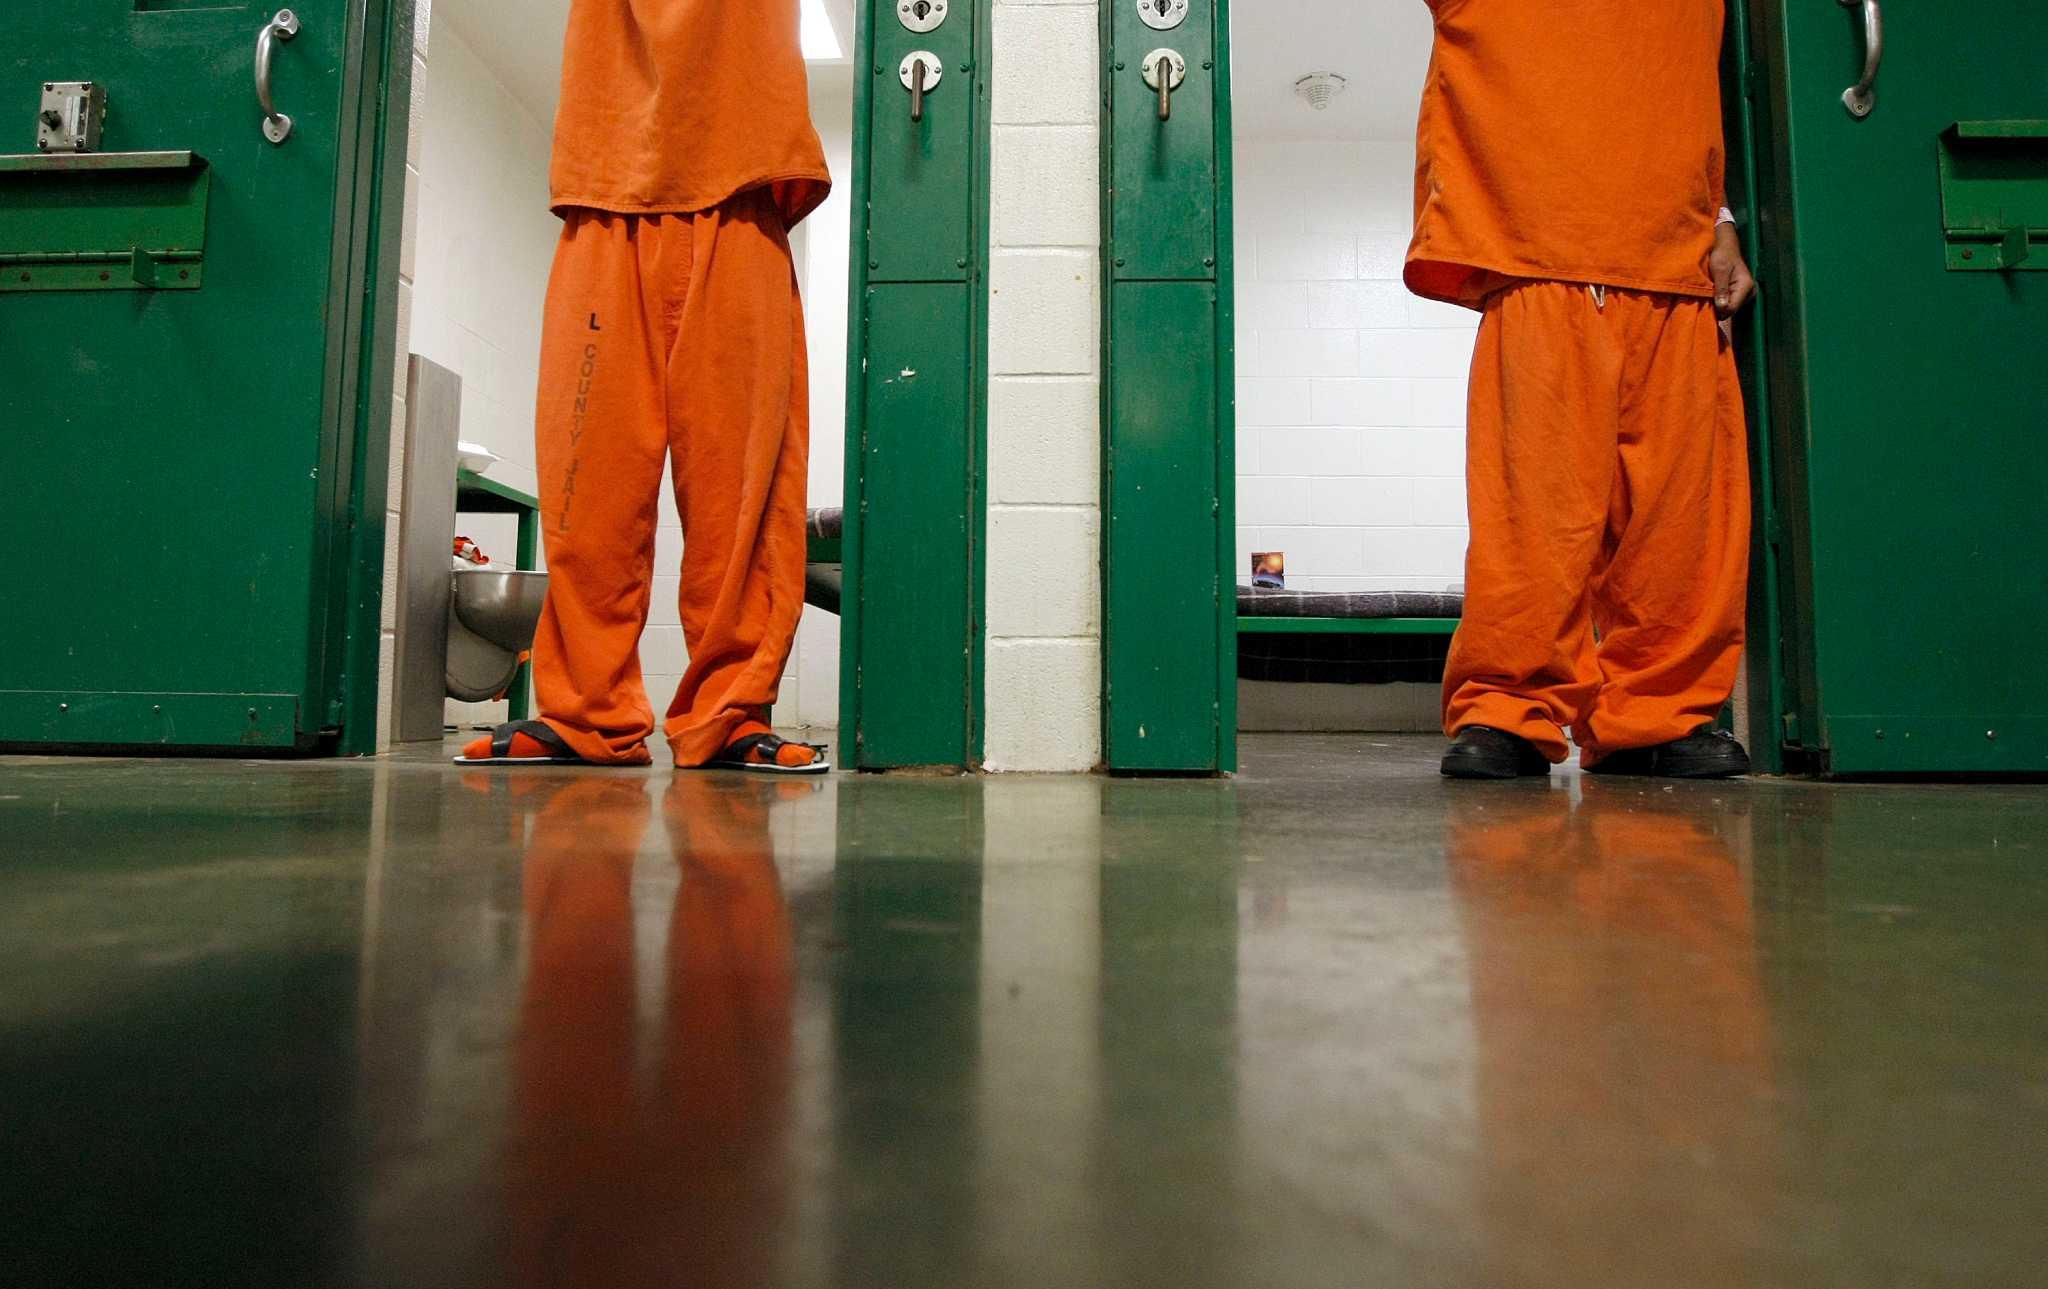 Juvenile Justice Agency Still Plagued By High Recidivism